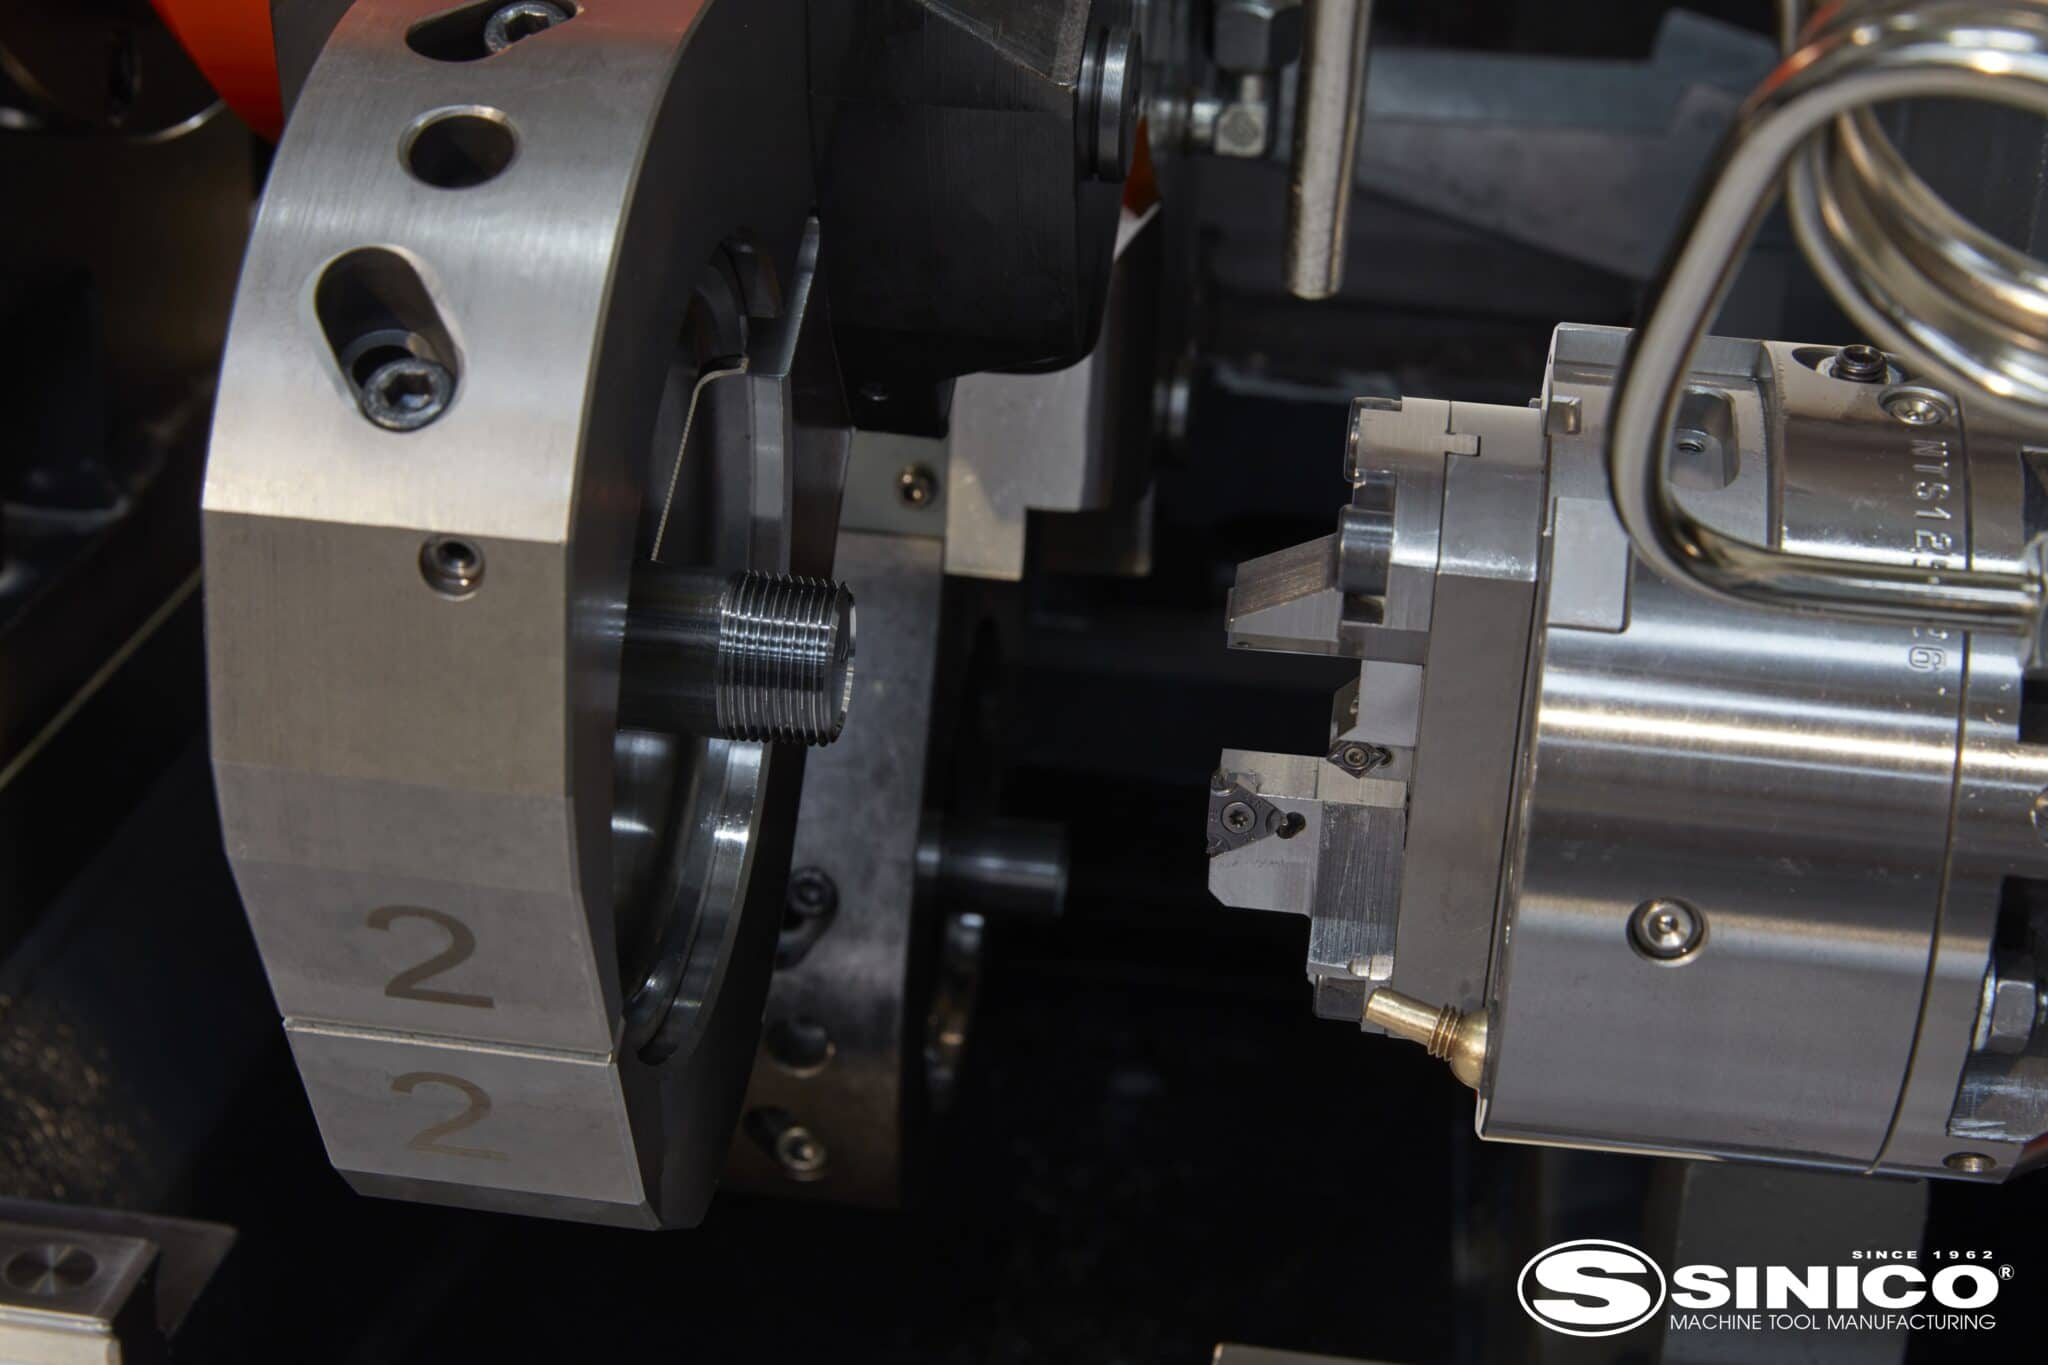 sinico manufacturing macchine